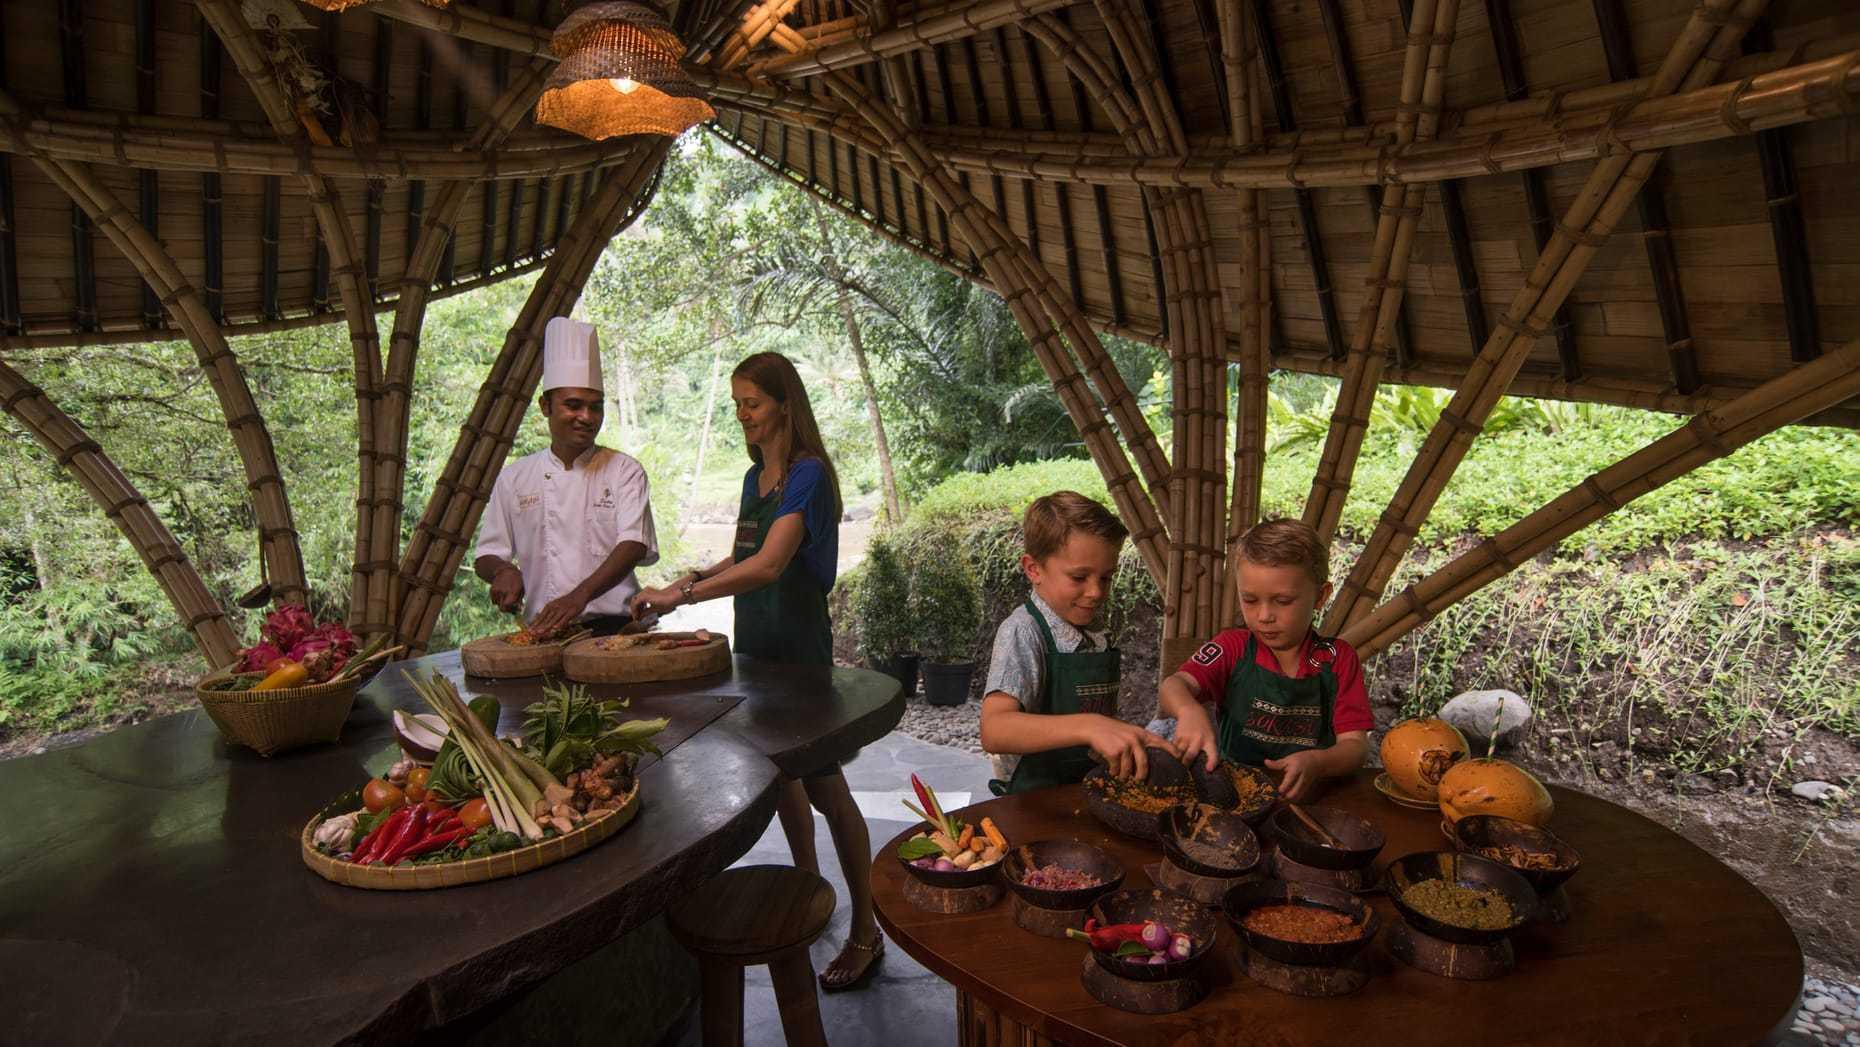 Agung Budi Raharsa   Architecture & Engineering Sokasi Bamboo Cooking Class / School - Bali Bali, Indonesia Bali, Indonesia Agung-Budi-Raharsa-Sokasi-Cooking-Class-School-Bali   88759